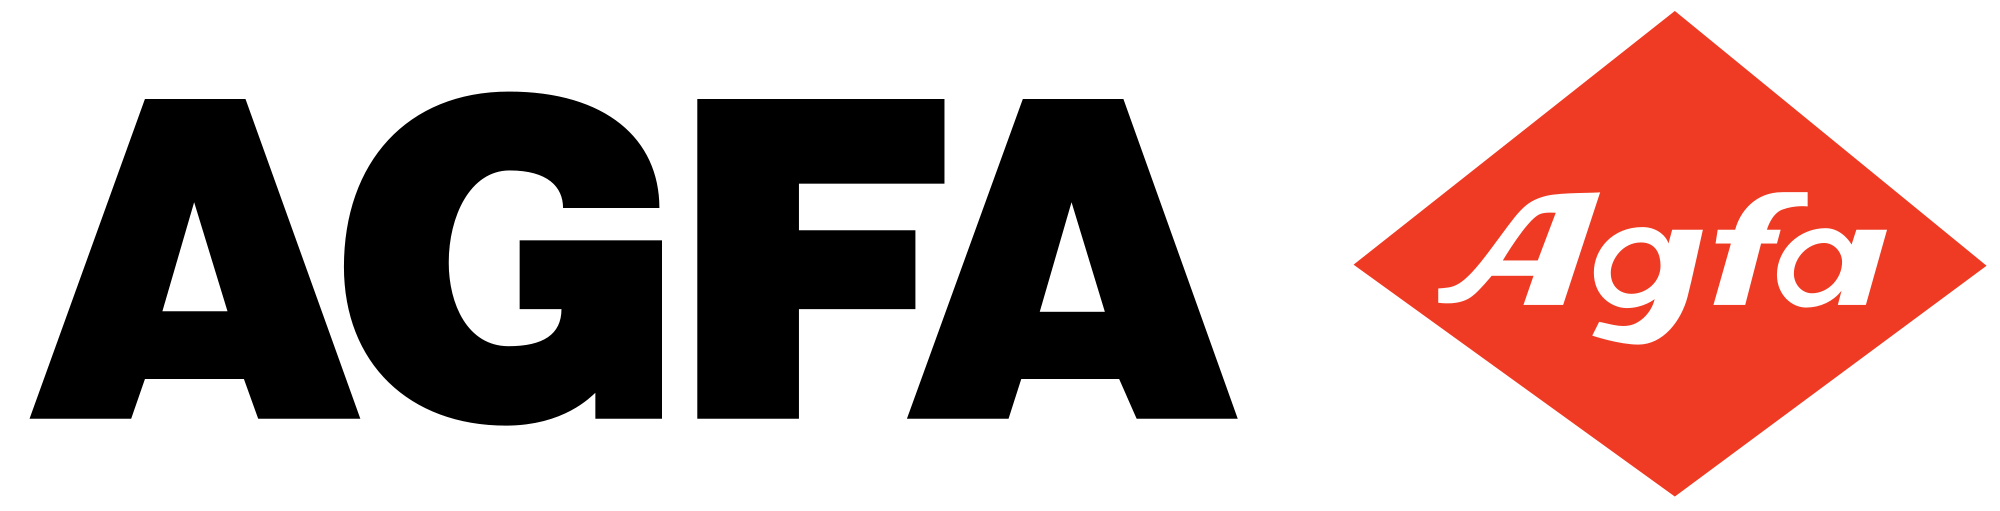 logo_Agfa